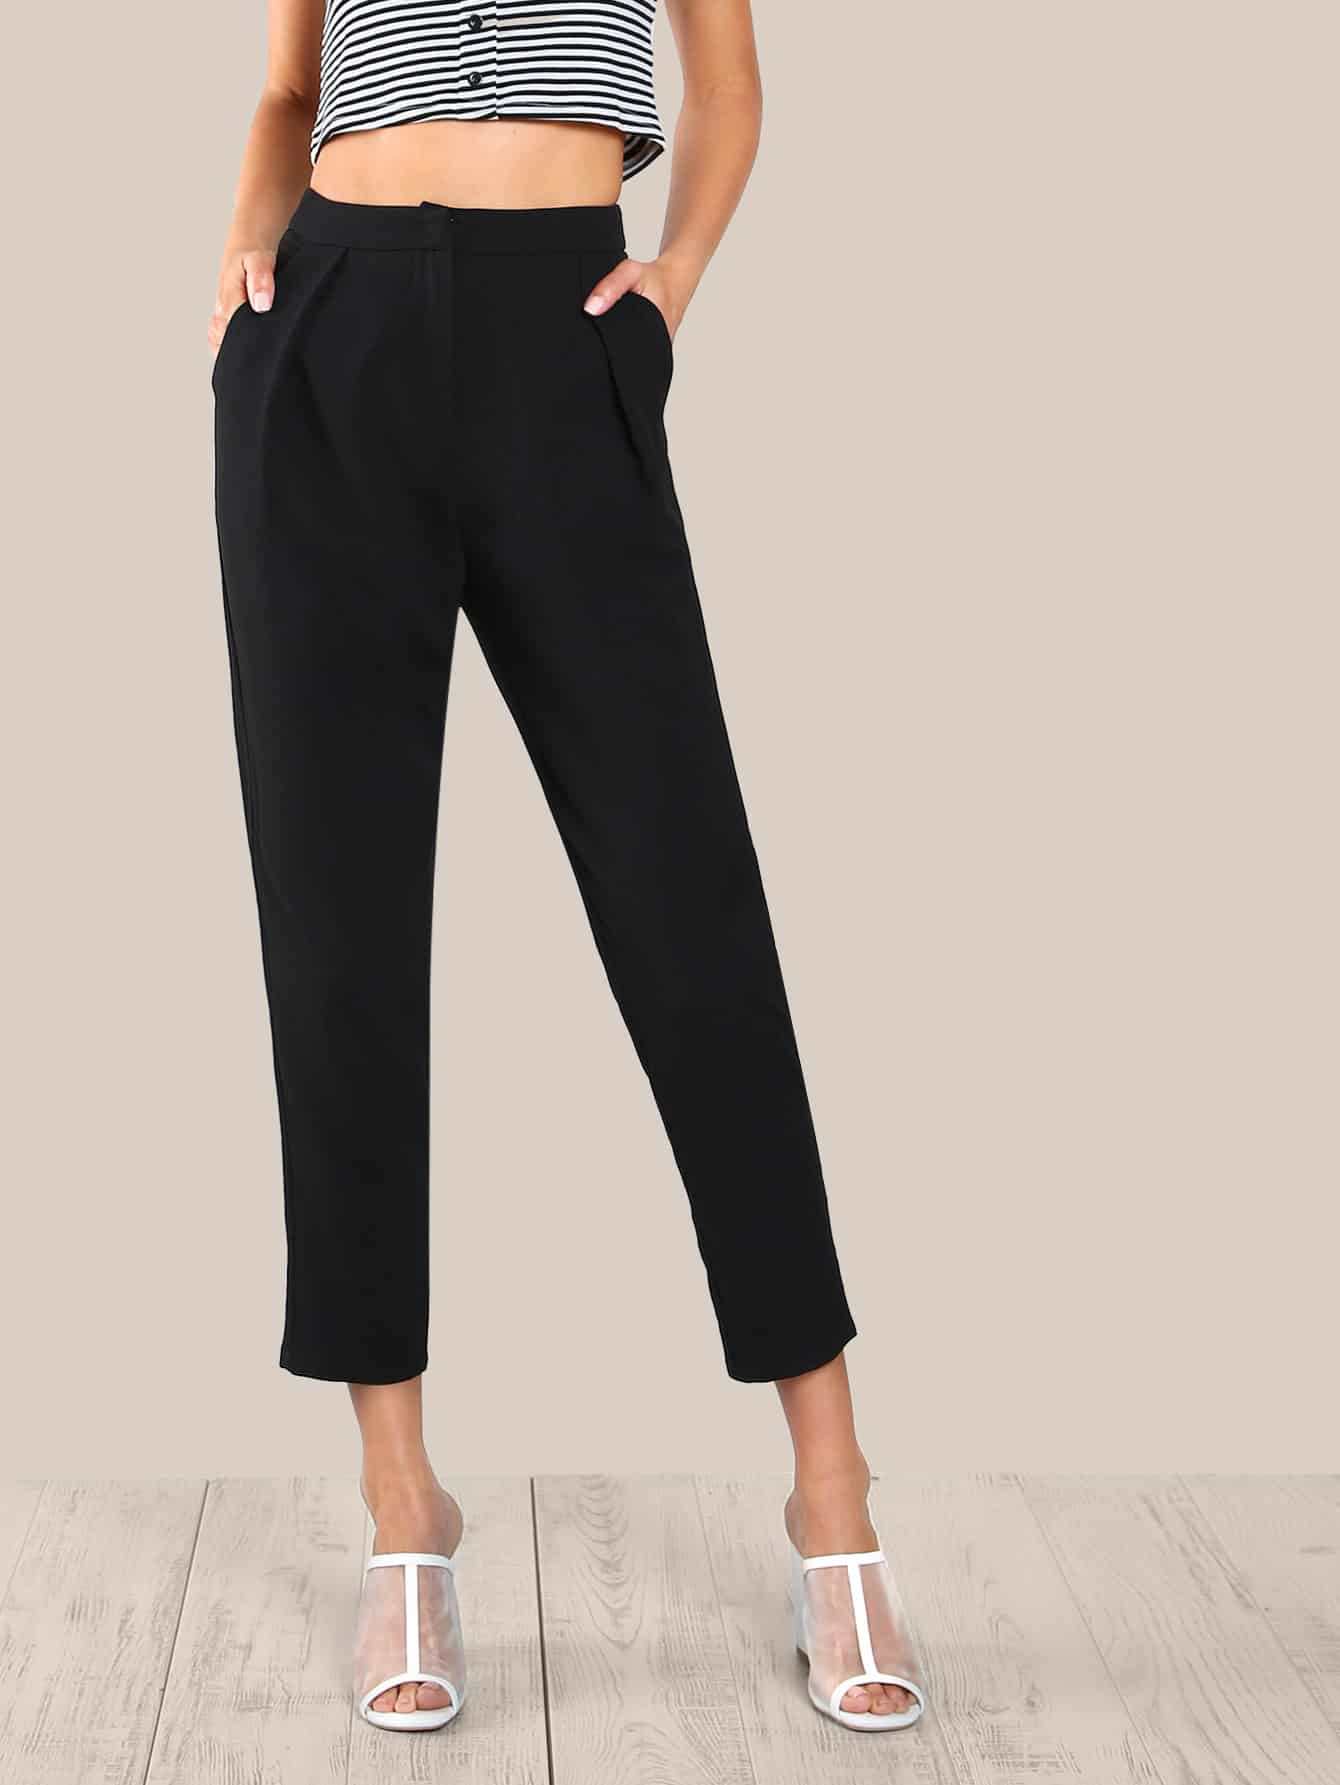 Fold Pleat Detail Peg Pants box pleat detail palazzo pants